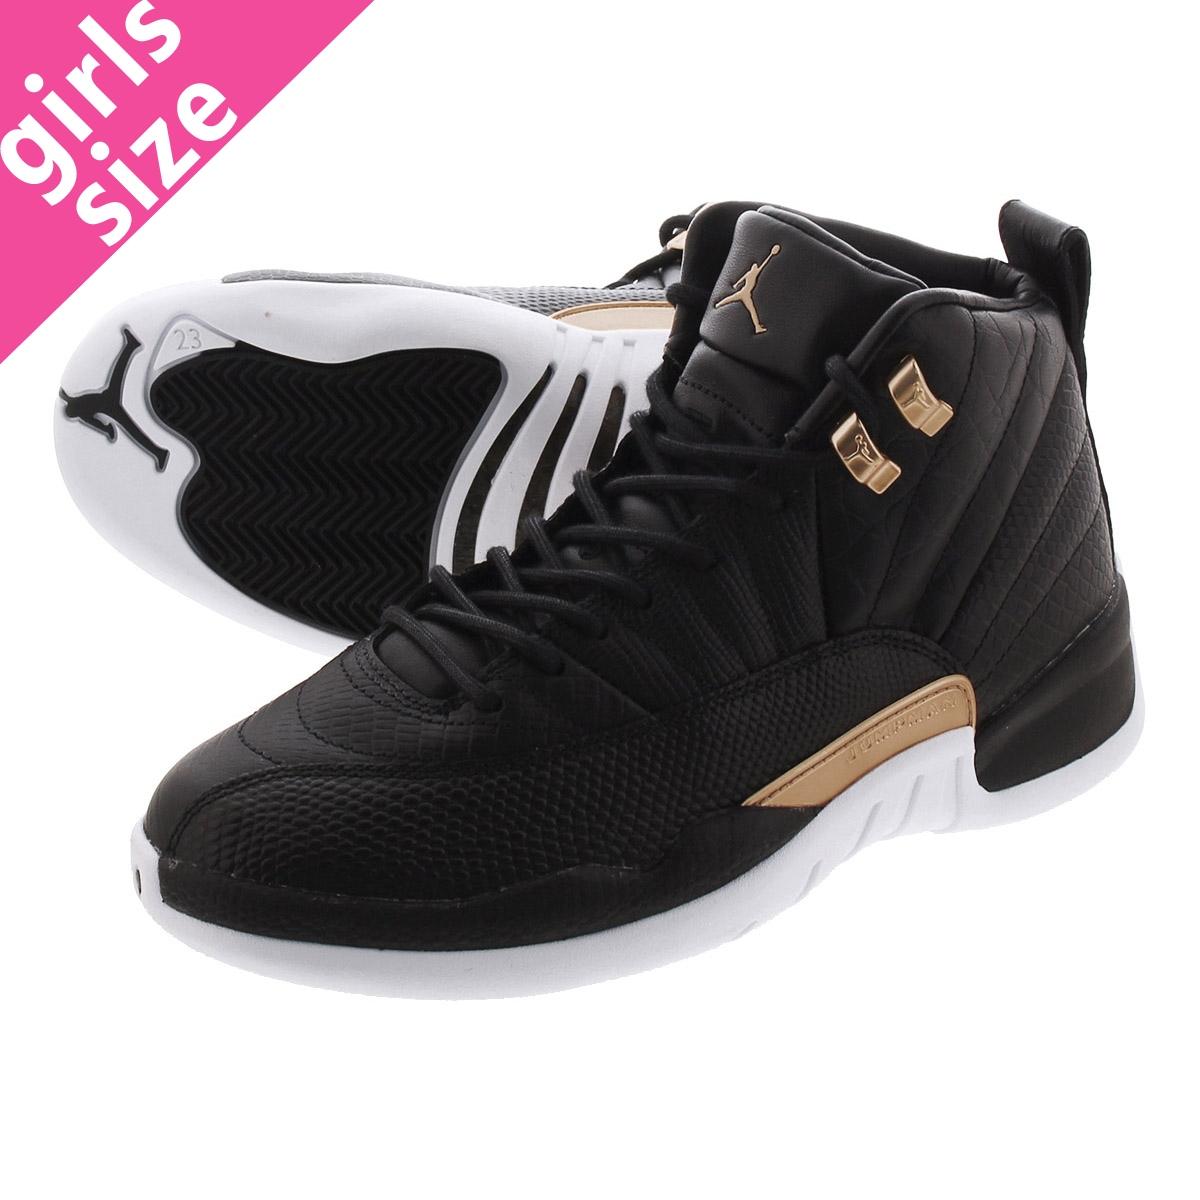 detailed look 01843 cc16e NIKE WMNS AIR JORDAN 12 RETRO Nike women Air Jordan 12 nostalgic  BLACK/METALLIC GOLD/WHITE ao6068-007